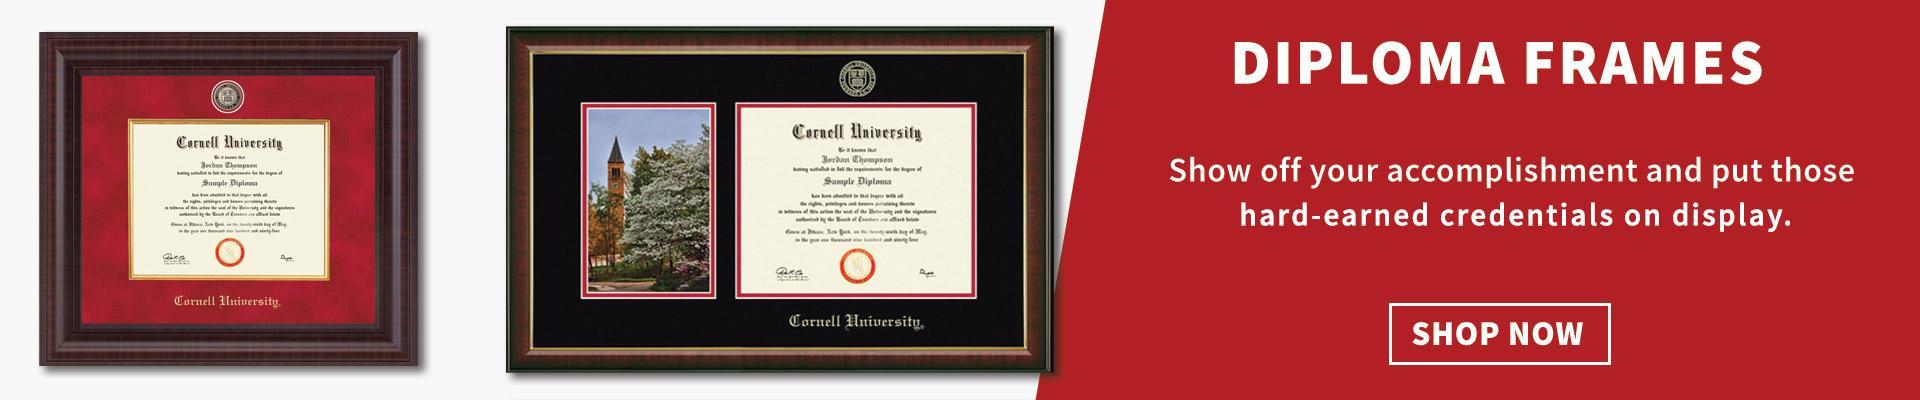 Shop Diploma Frames Now - image of Cornell University diploma frames